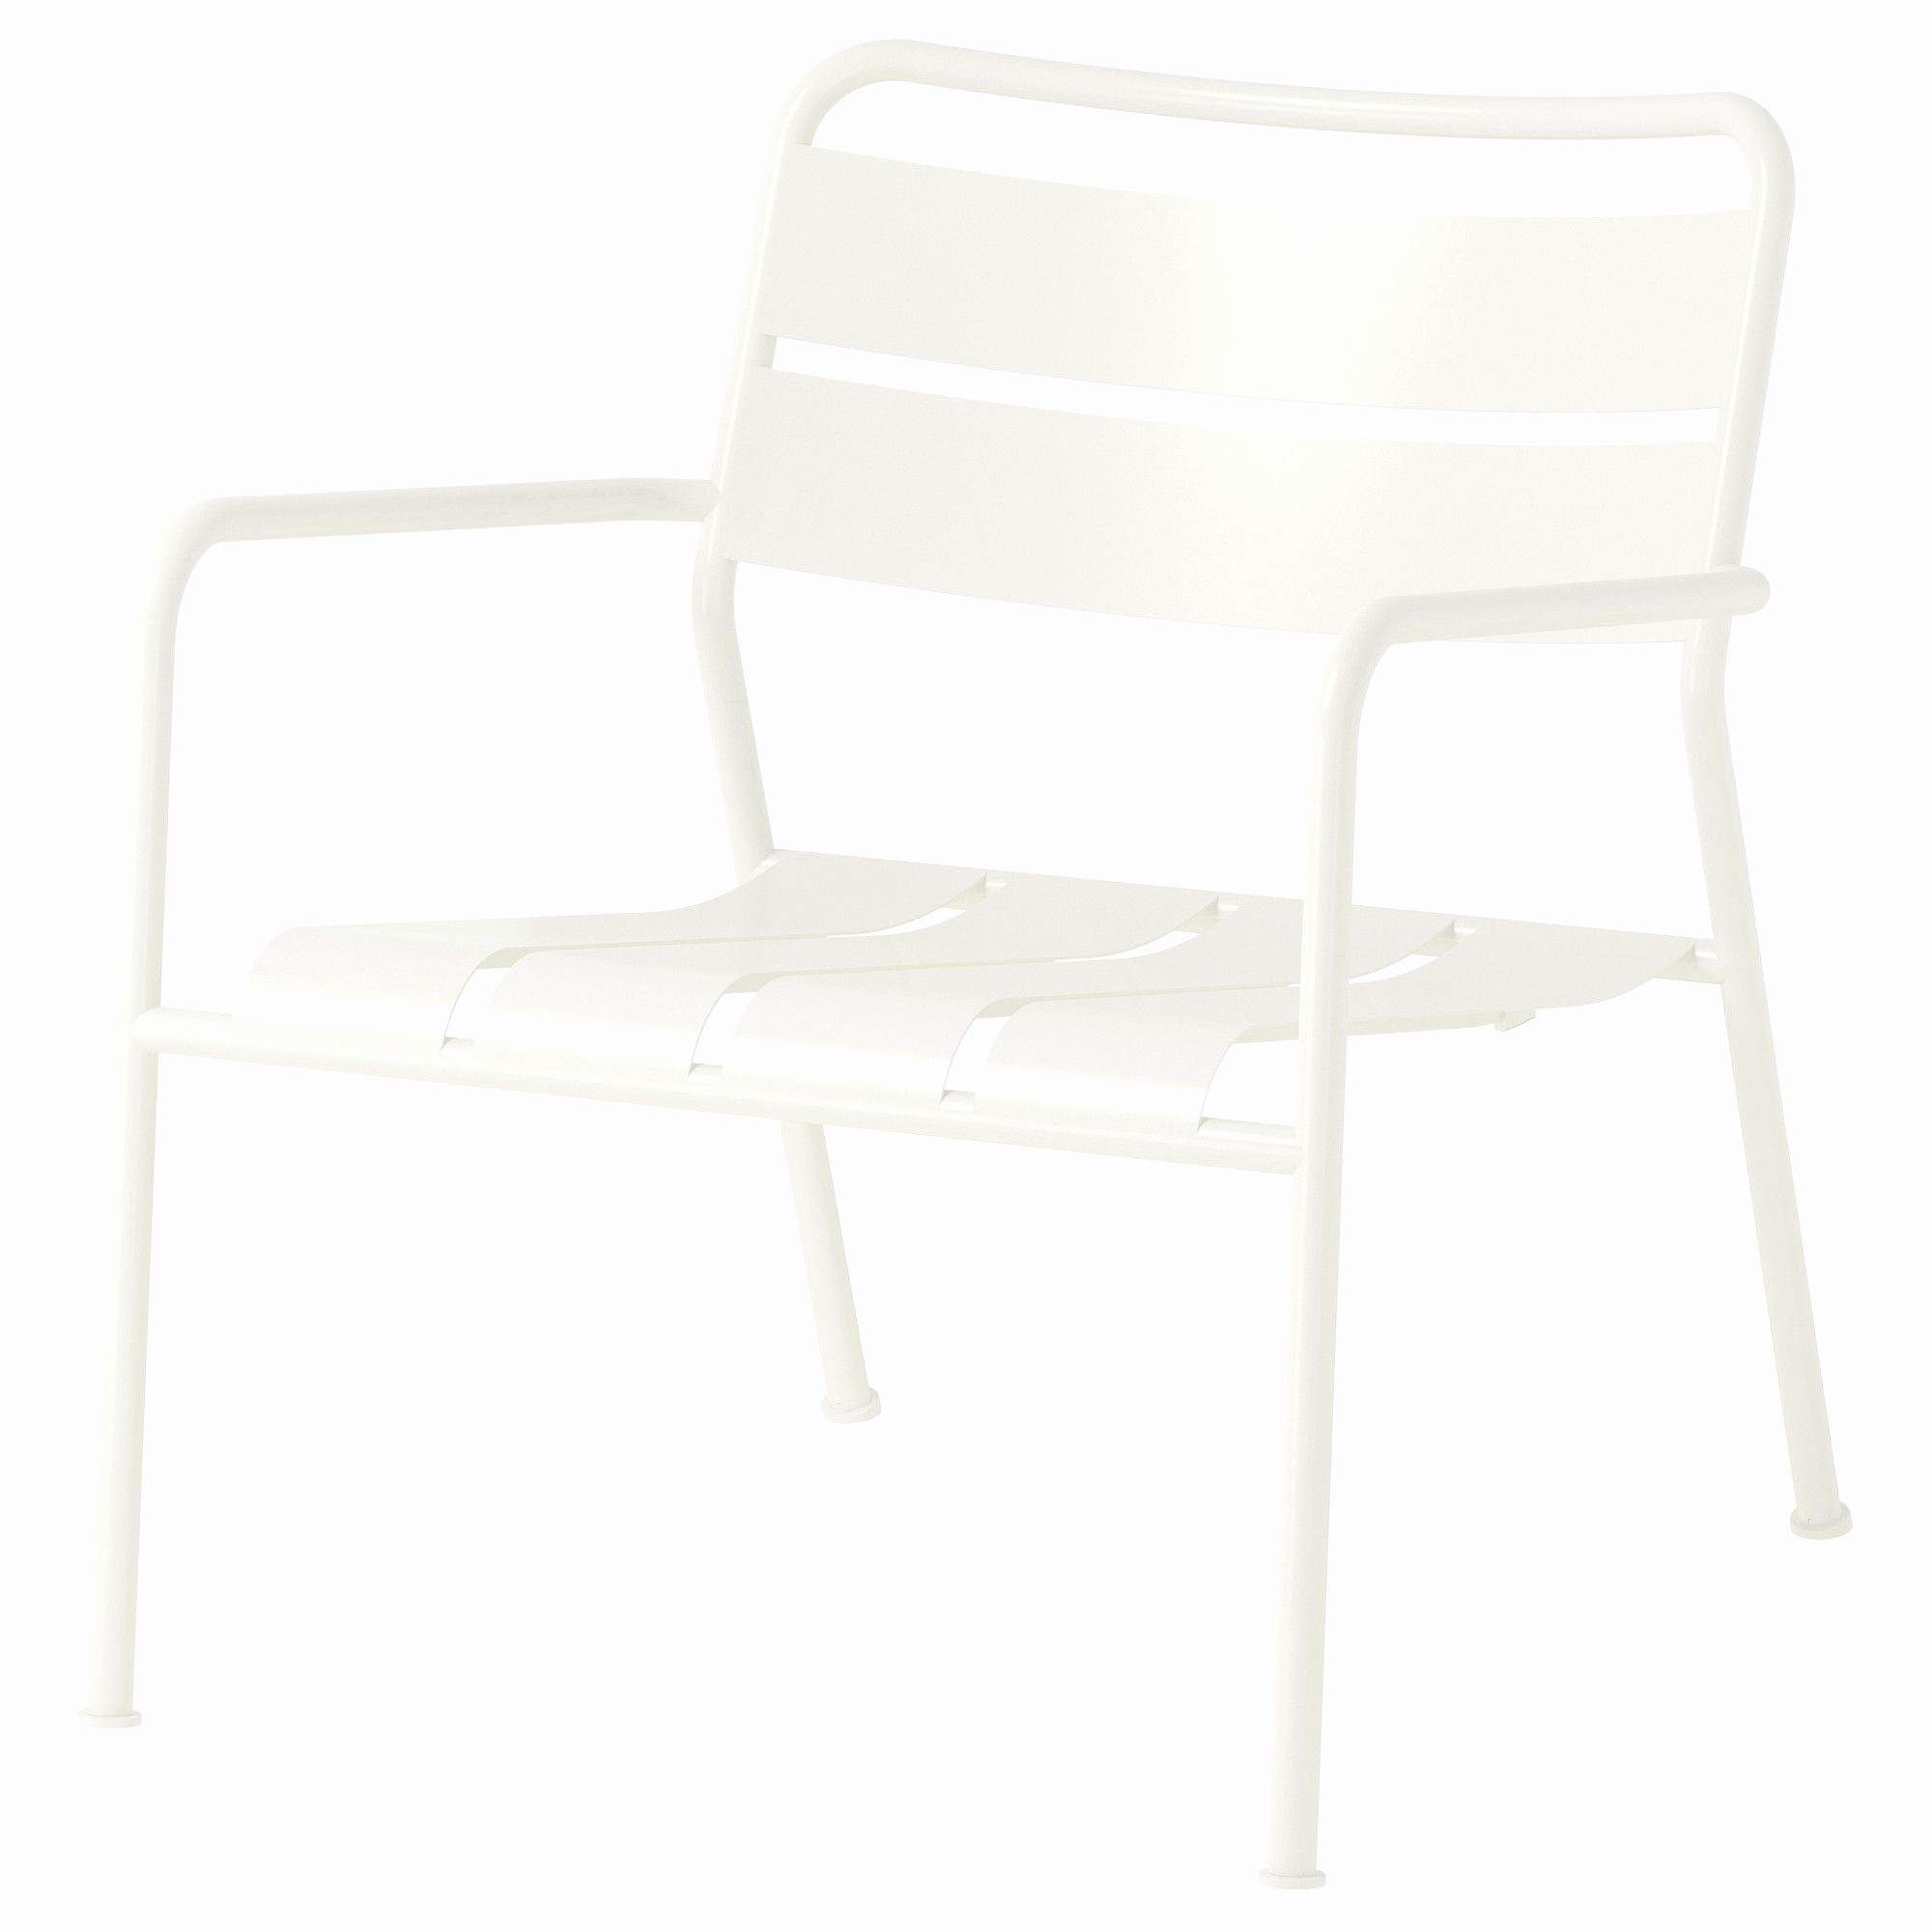 Armoire De Jardin Ikea Armoire De Jardin Ikea Armoire Et Penderie Pas Cher Une Armoire Ou Une Penderie Nos Armoires Pende Furniture Outdoor Chairs Home Decor